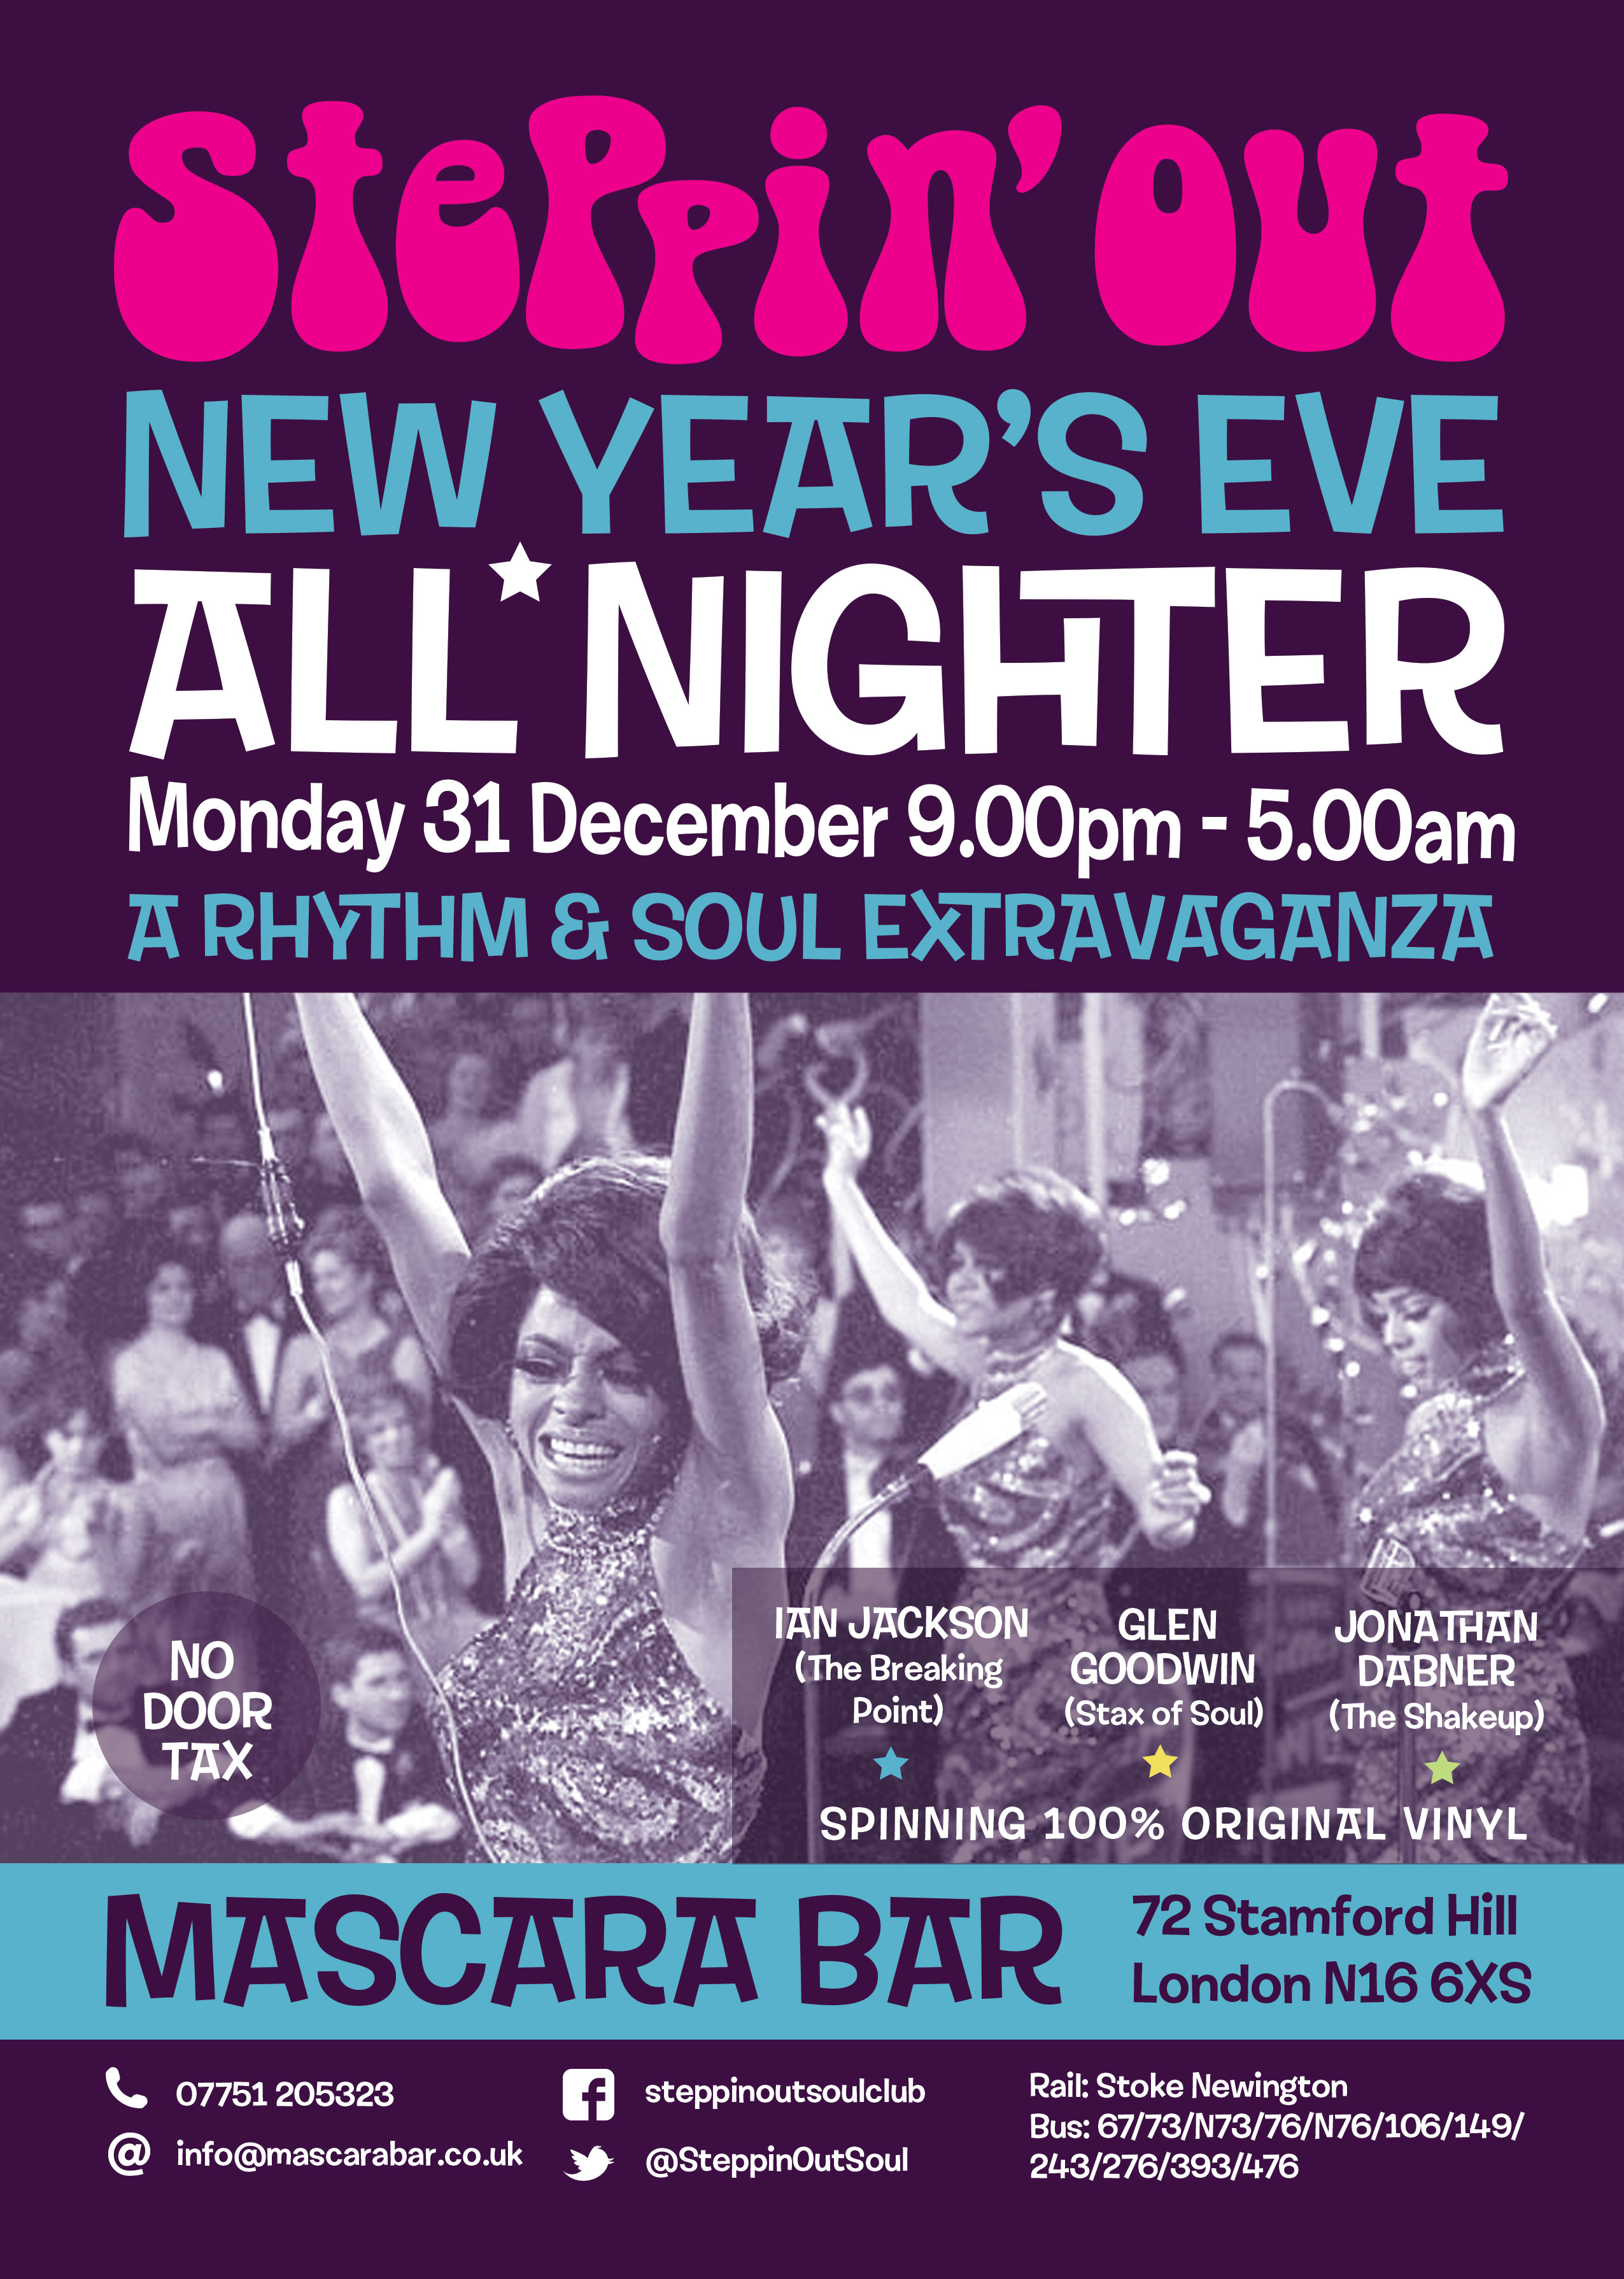 Steppin' Out New Years Allnighter - DJs Ian Jackson, Glen Goodwin & Jonathan Dabner. London N16 6XS - Northern Soul, Vintage / 60s R&B, 60s Soul, Tamla Motown, Mod Jazz, Boogaloo & Ska. 31/12/18